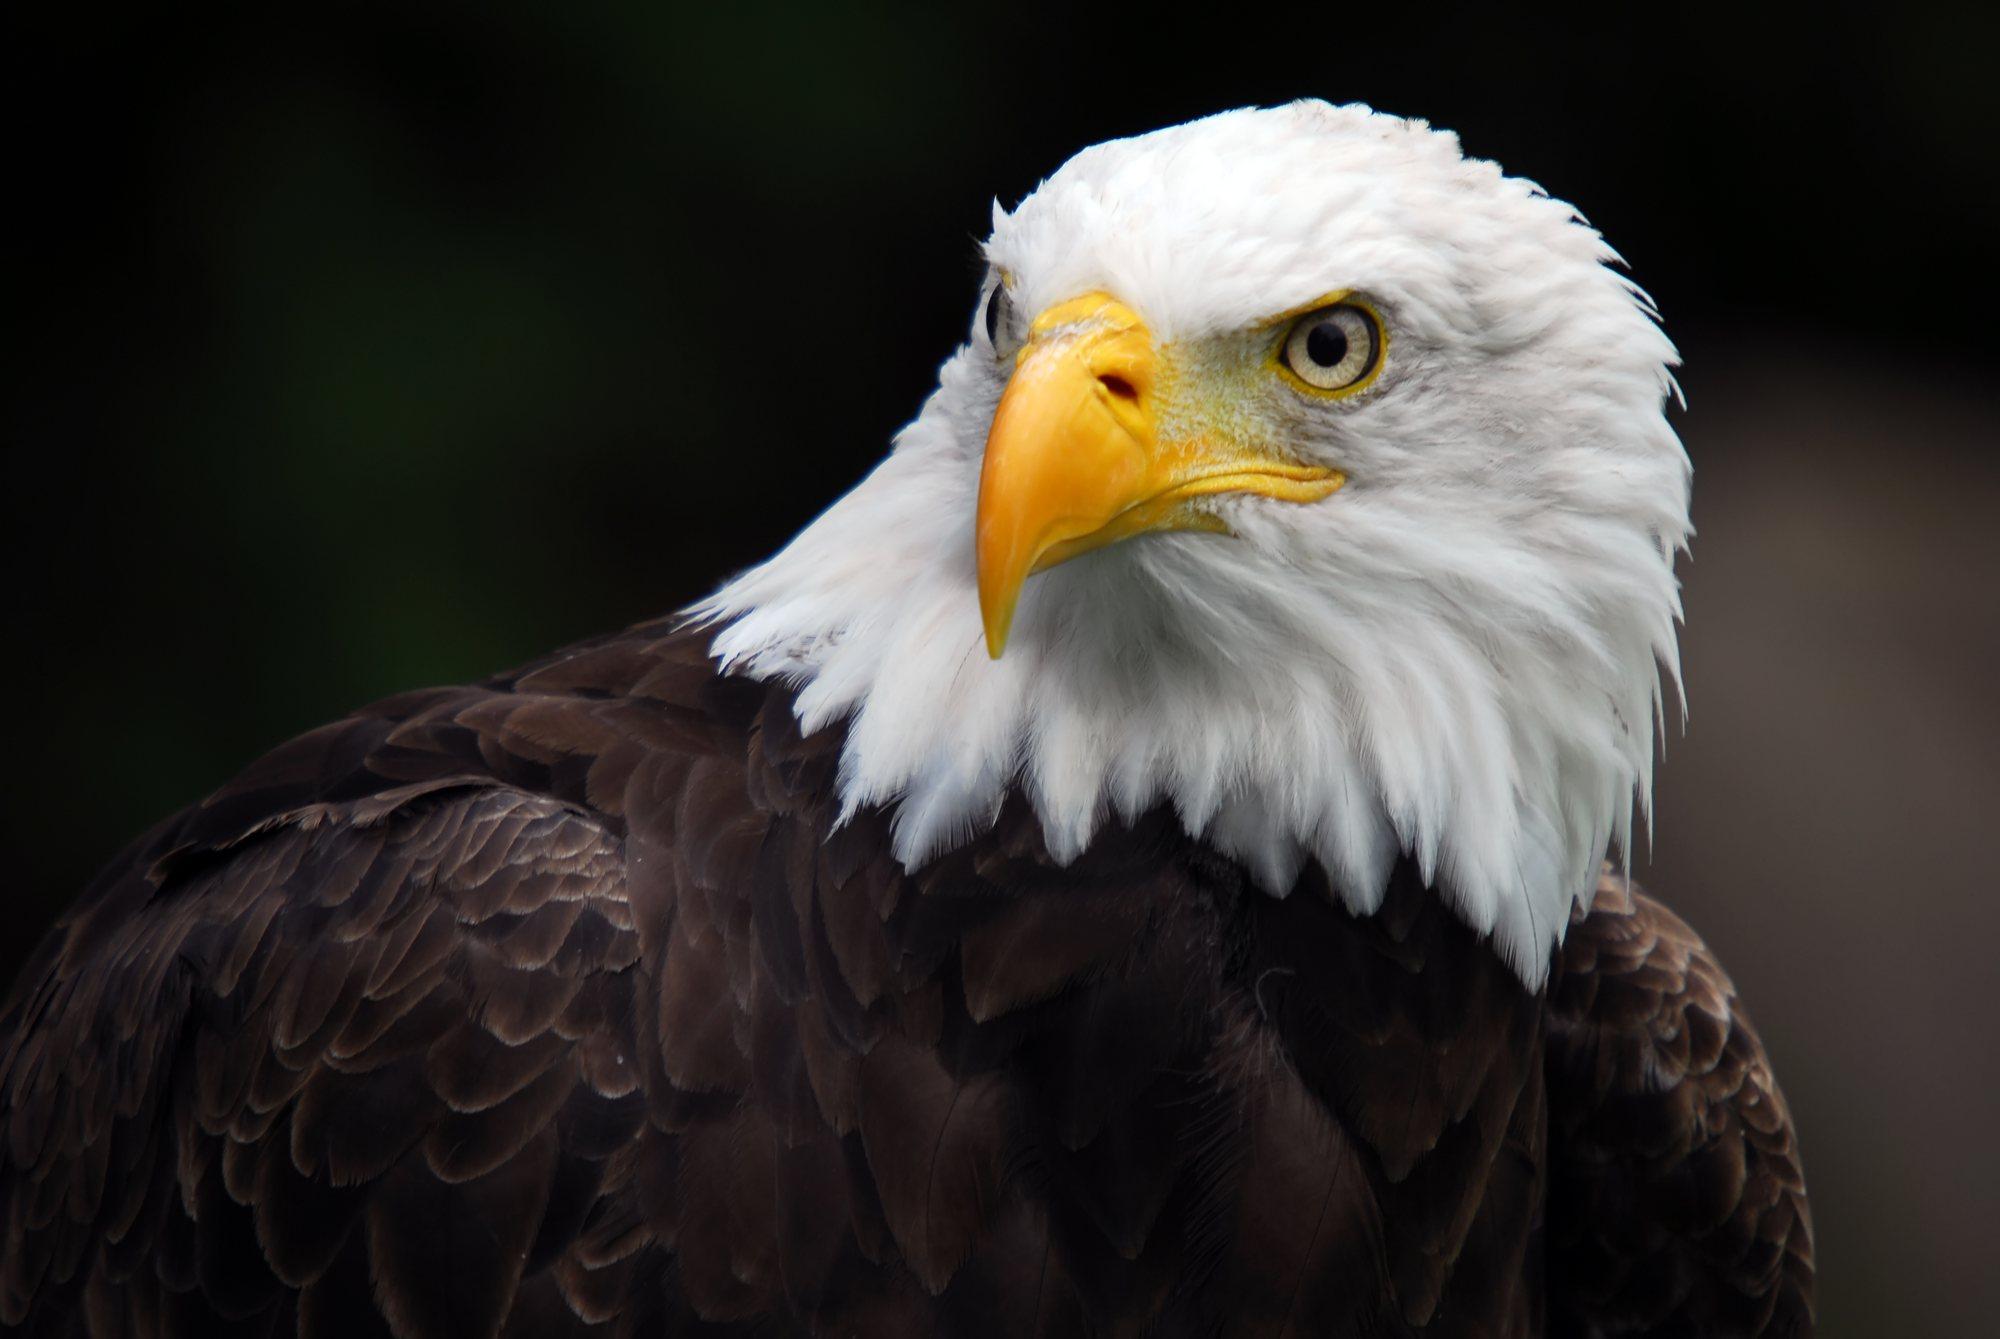 Hd wallpaper eagle - Hd Wallpaper Background Id 403514 2000x1339 Animal Bald Eagle